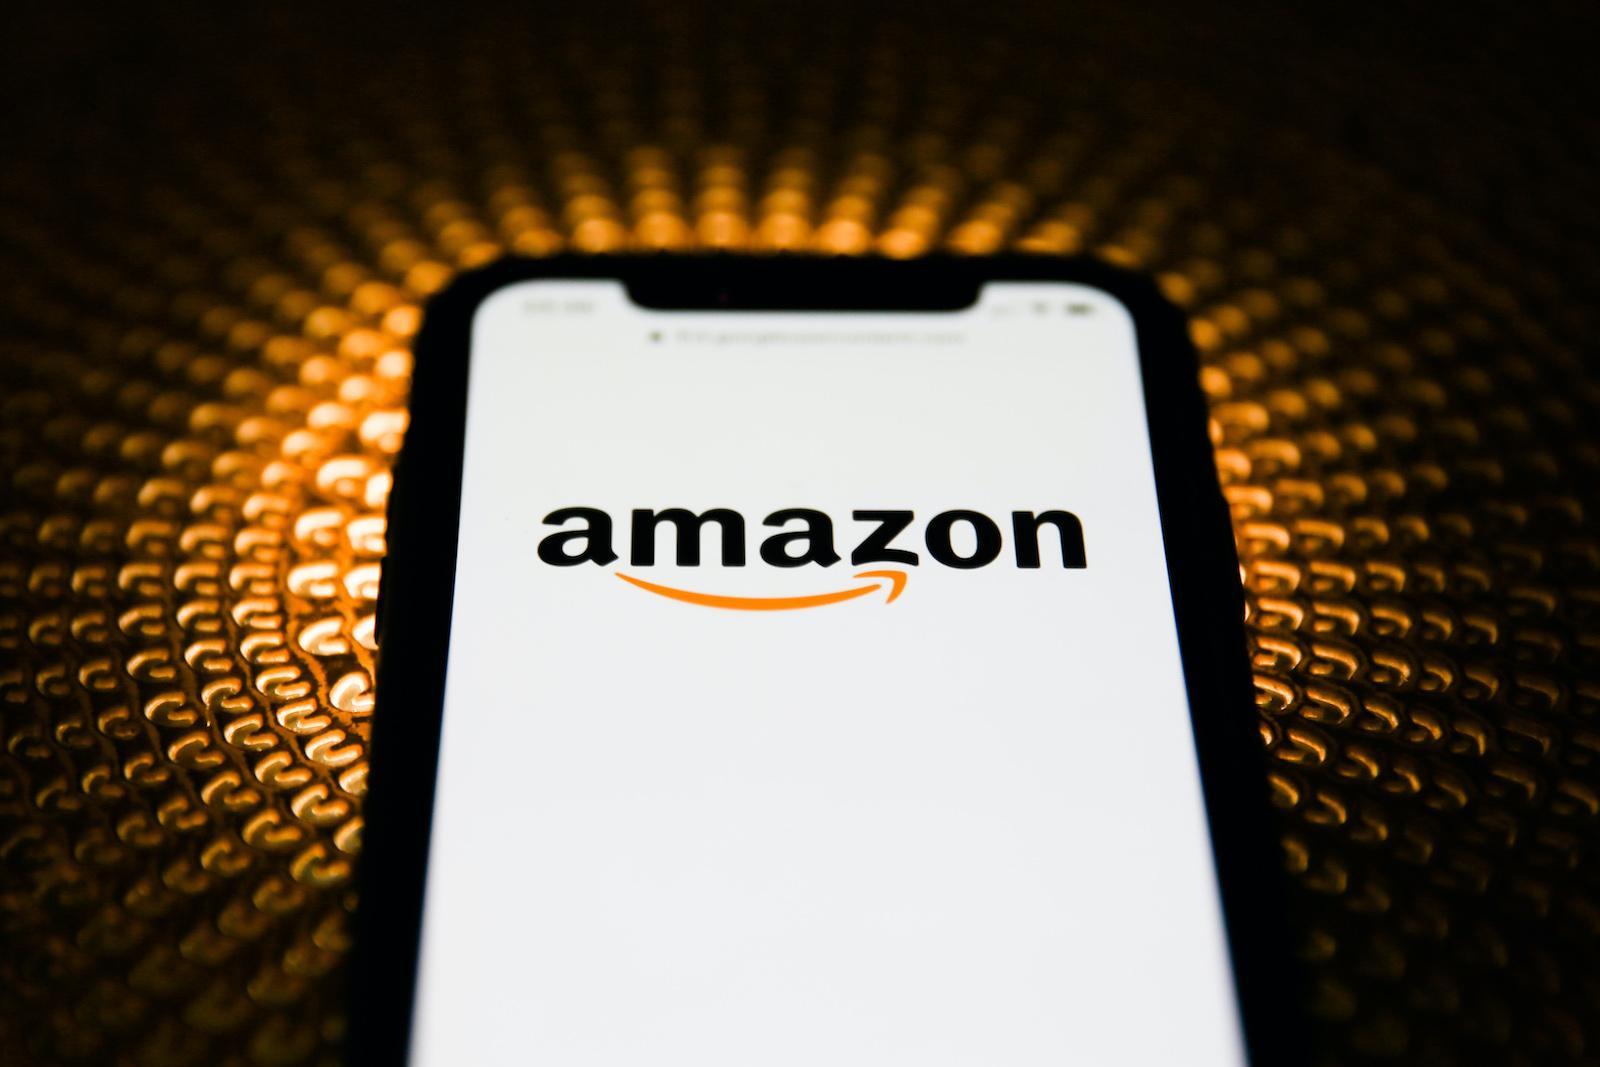 Amazon logo is seen displayed on phone screen in this illustration photo taken in Poland on February 20, 2020. (Photo illustration byJakub Porzycki/NurPhoto)